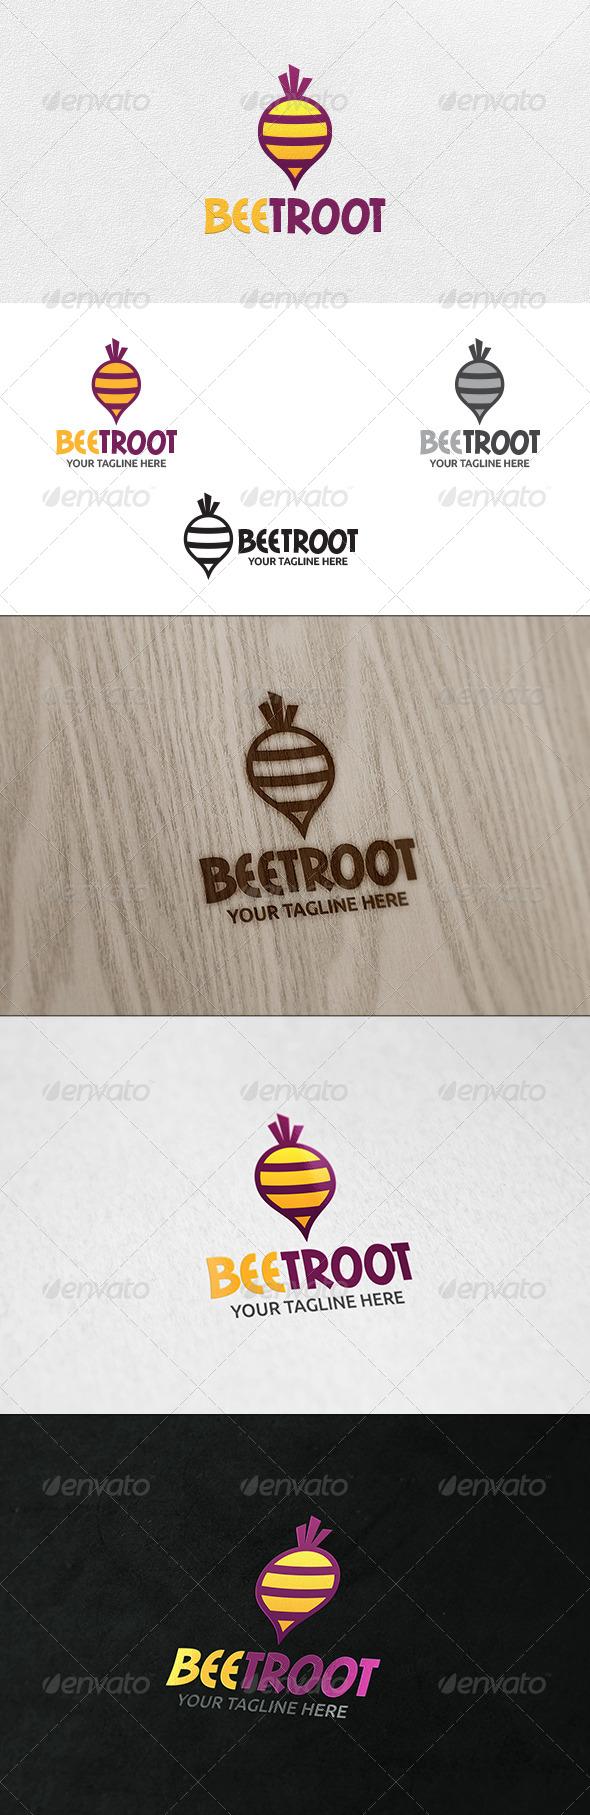 Beetroot - Logo Template - Nature Logo Templates